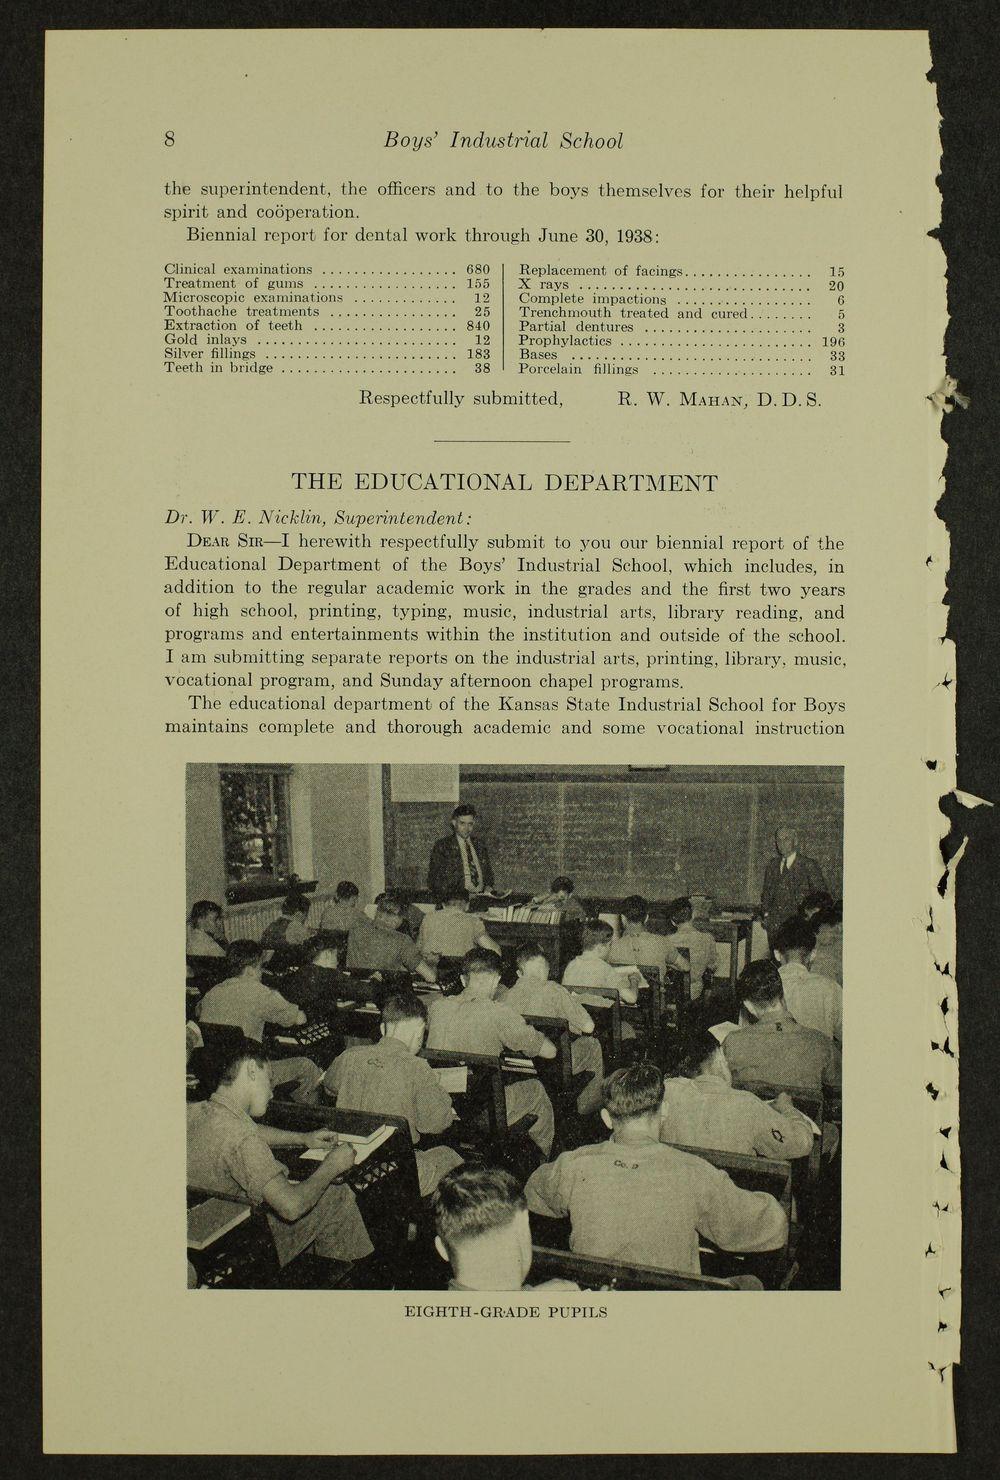 Biennial report of the Boys Industrial School, 1938 - 8